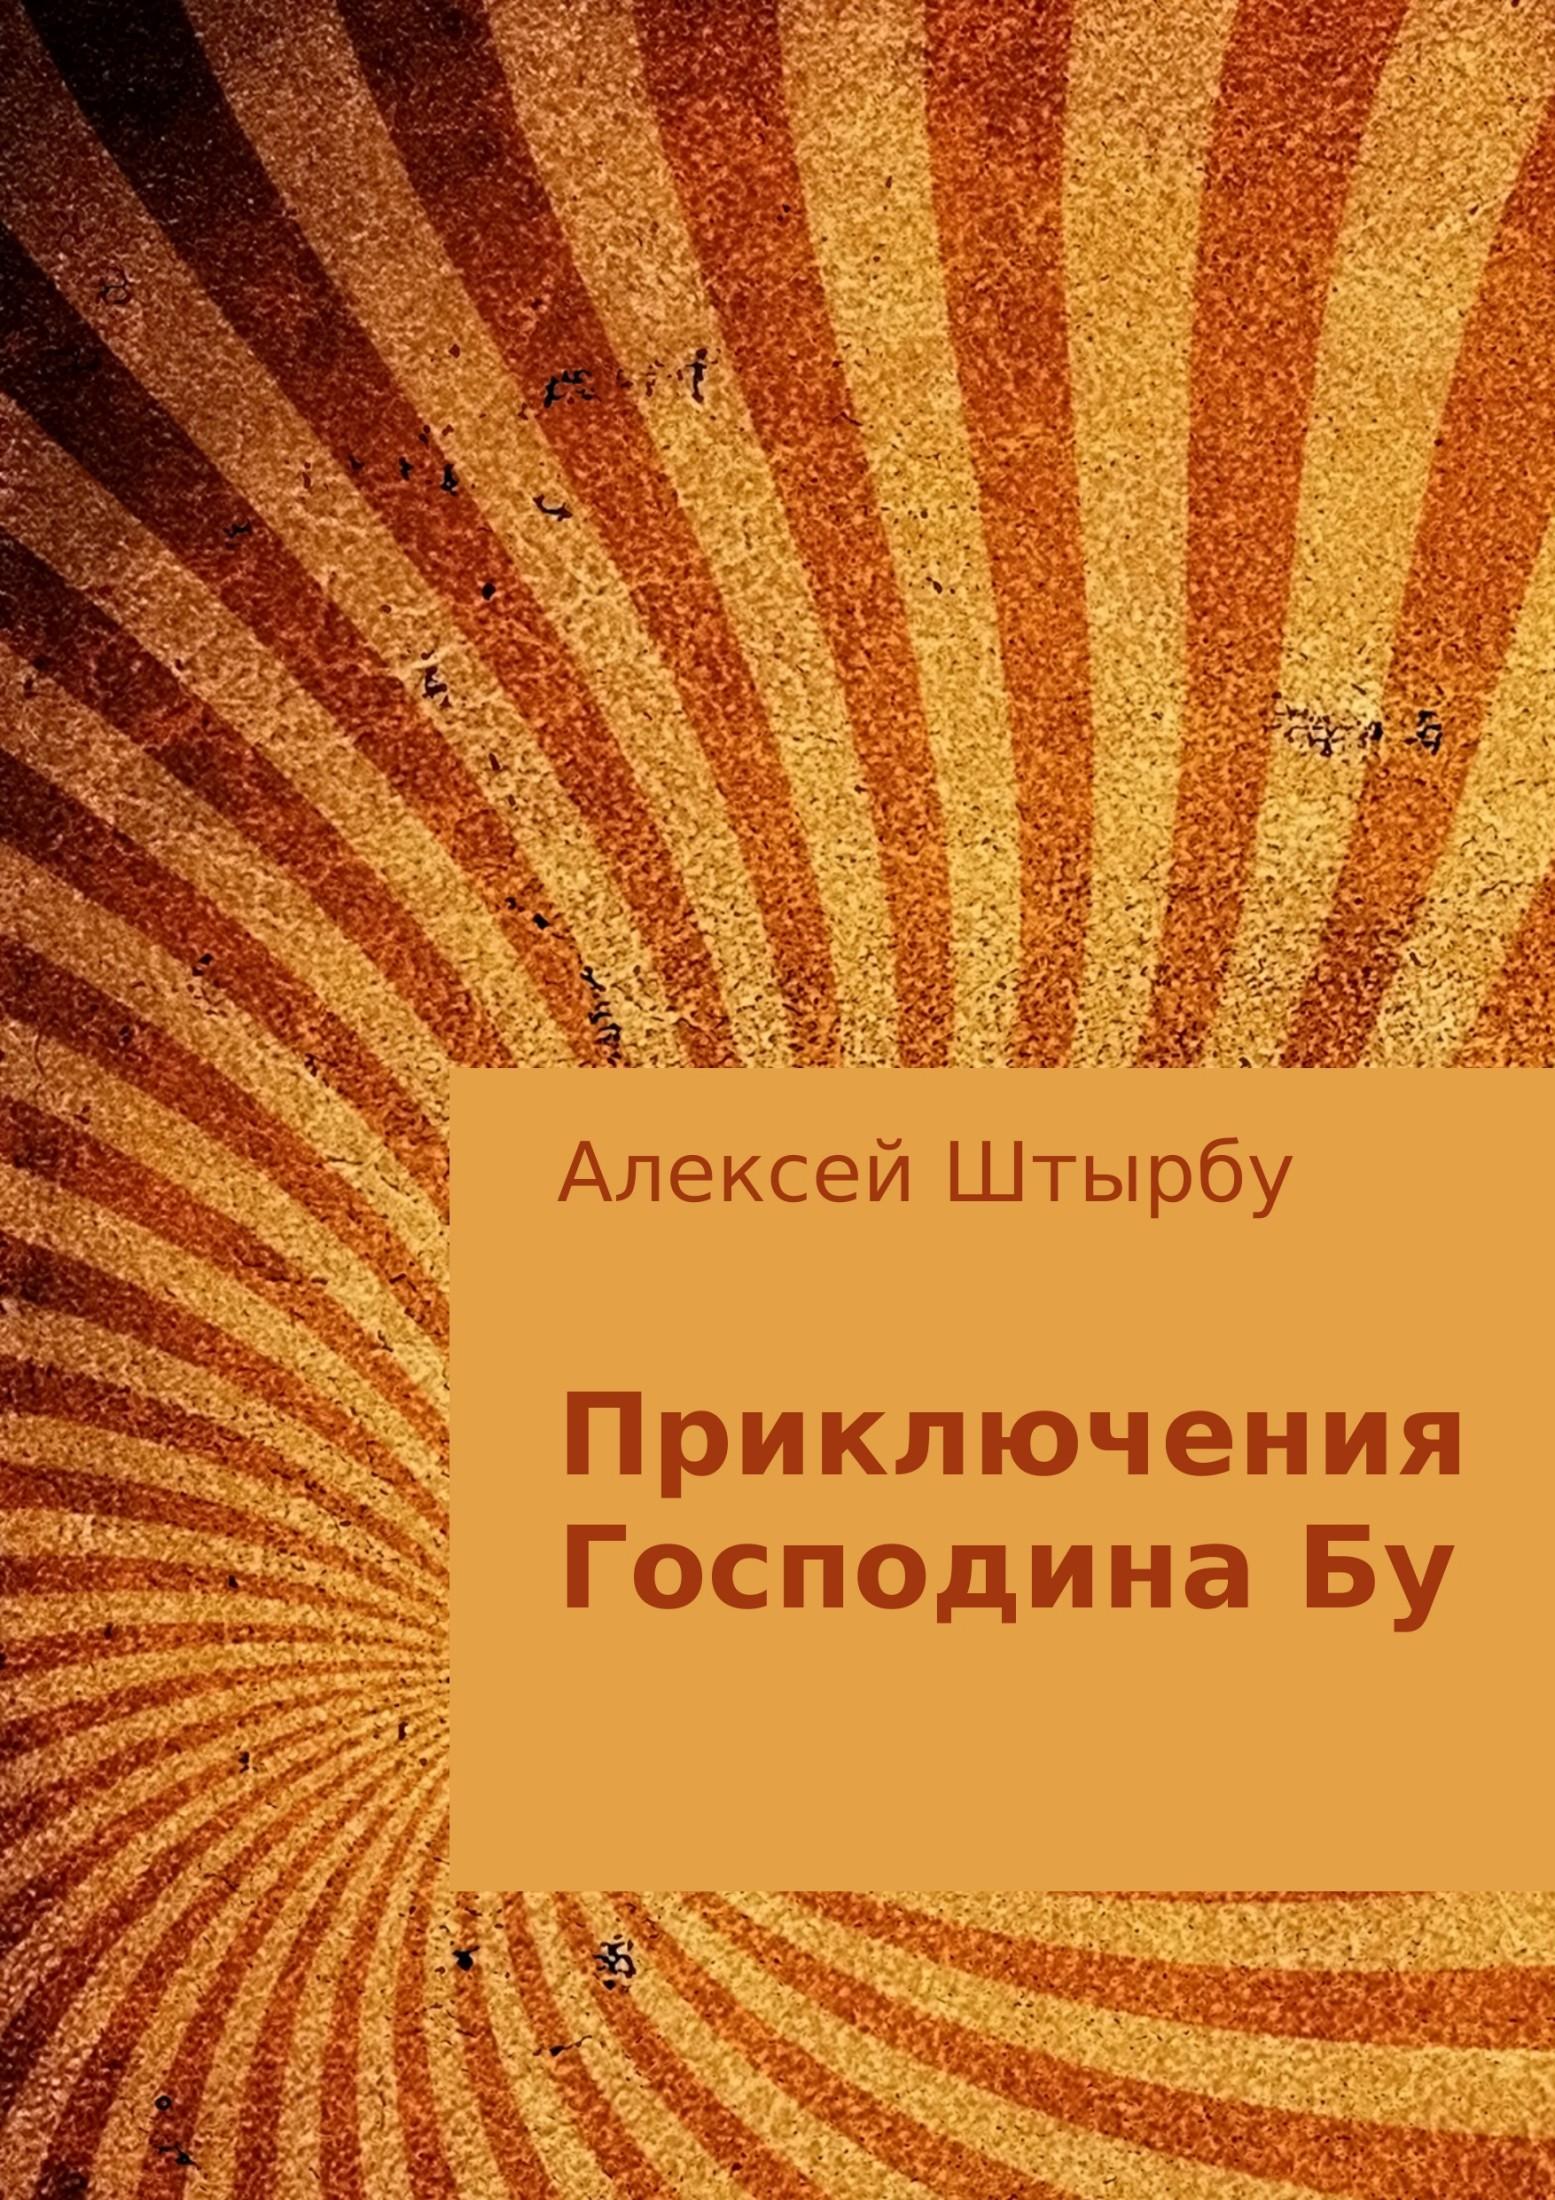 Алексей Викторович Штырбу. Приключения Господина Бу